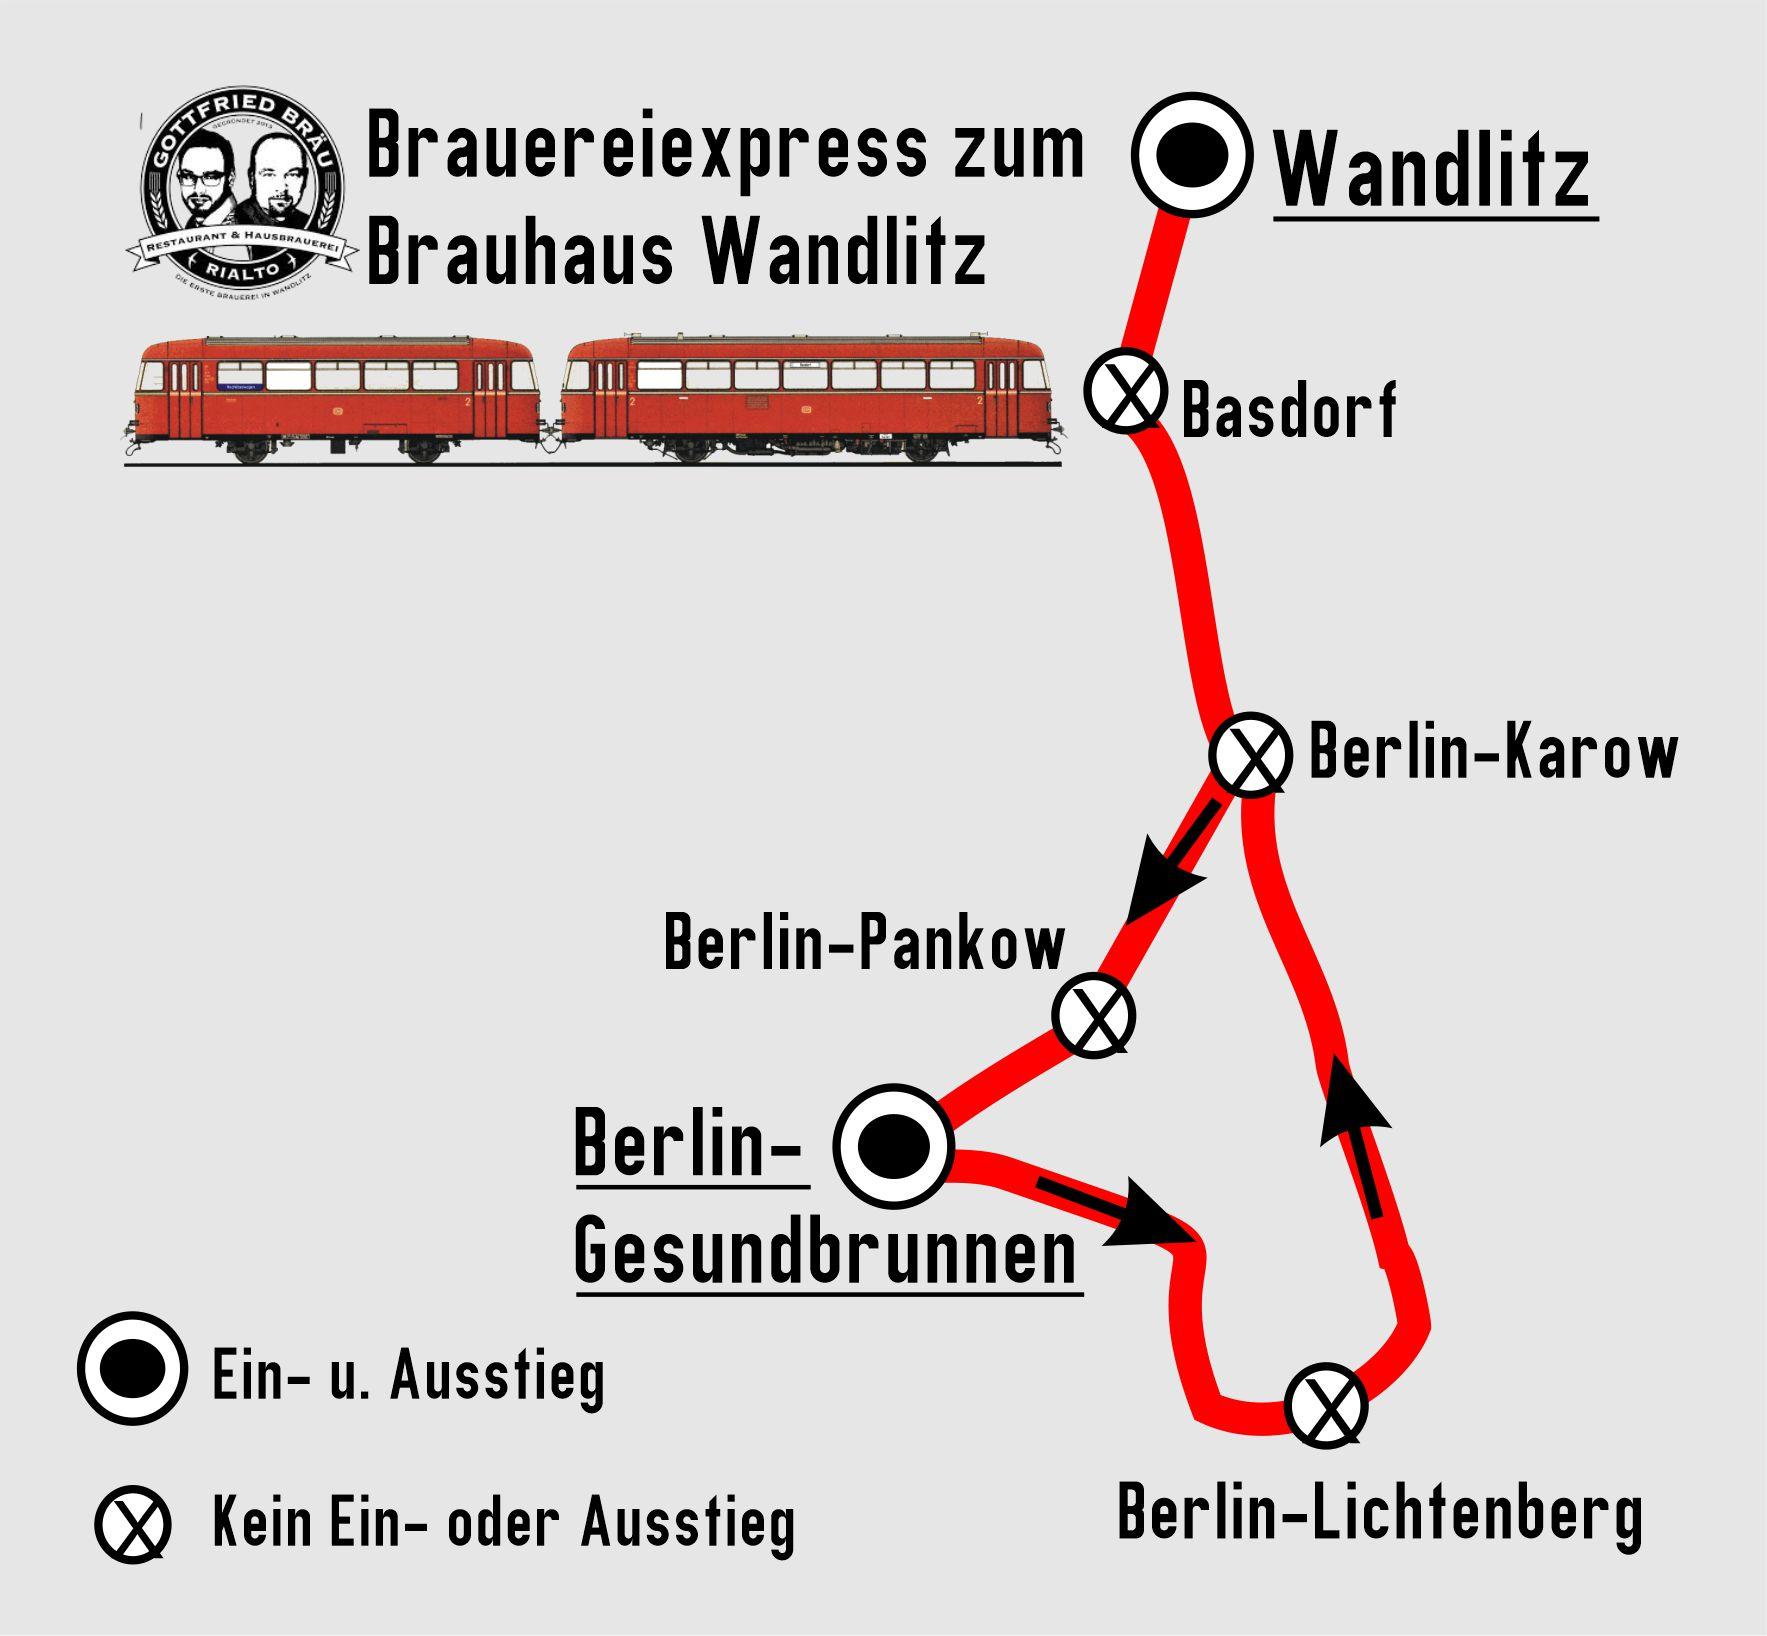 BEF Brauhausfahrt Streckenkarte Berlin-Gesundbrunnen - Wandlitz